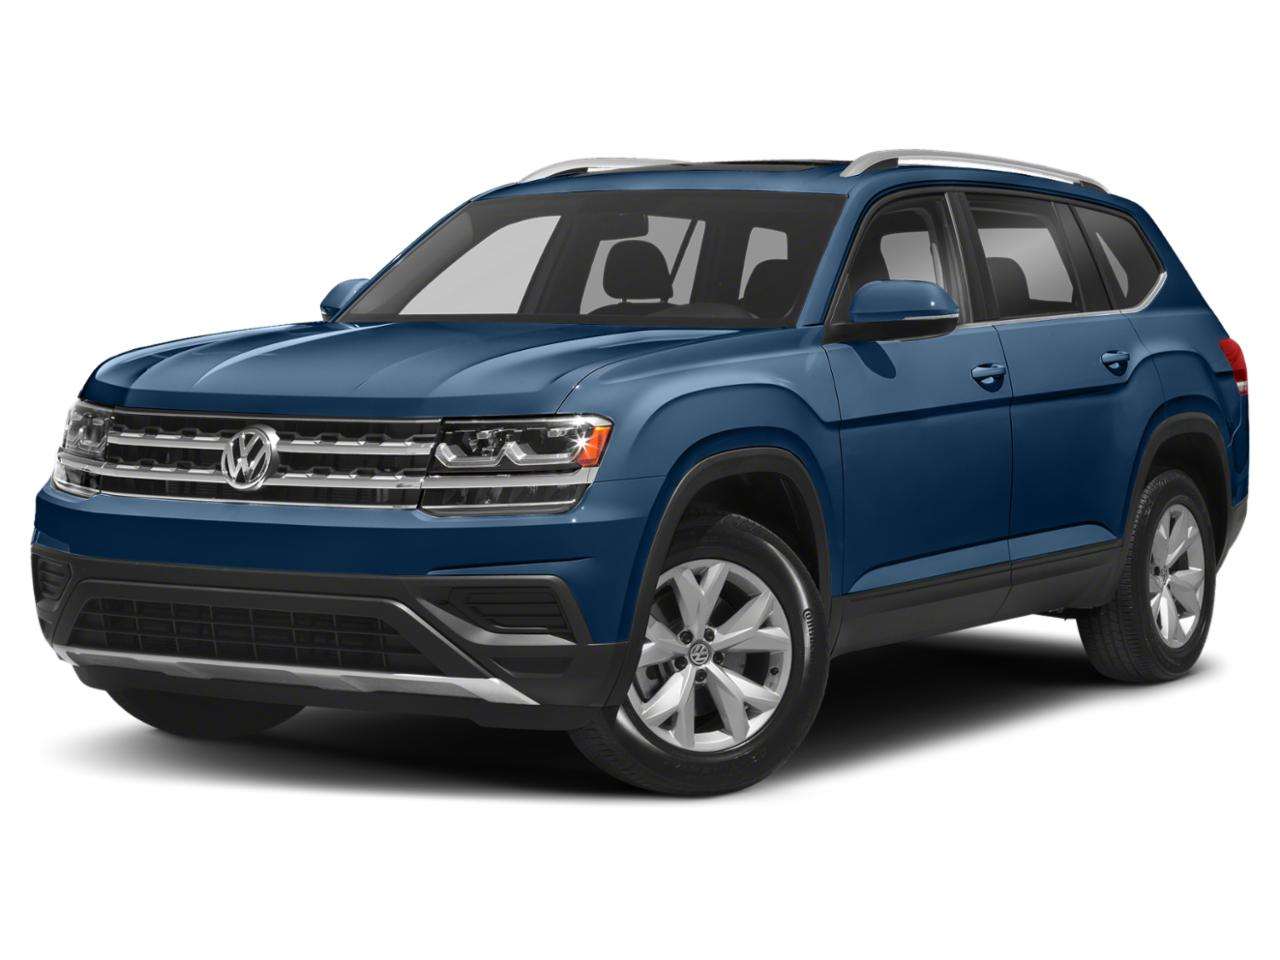 2018 Volkswagen Atlas Vehicle Photo in San Antonio, TX 78238